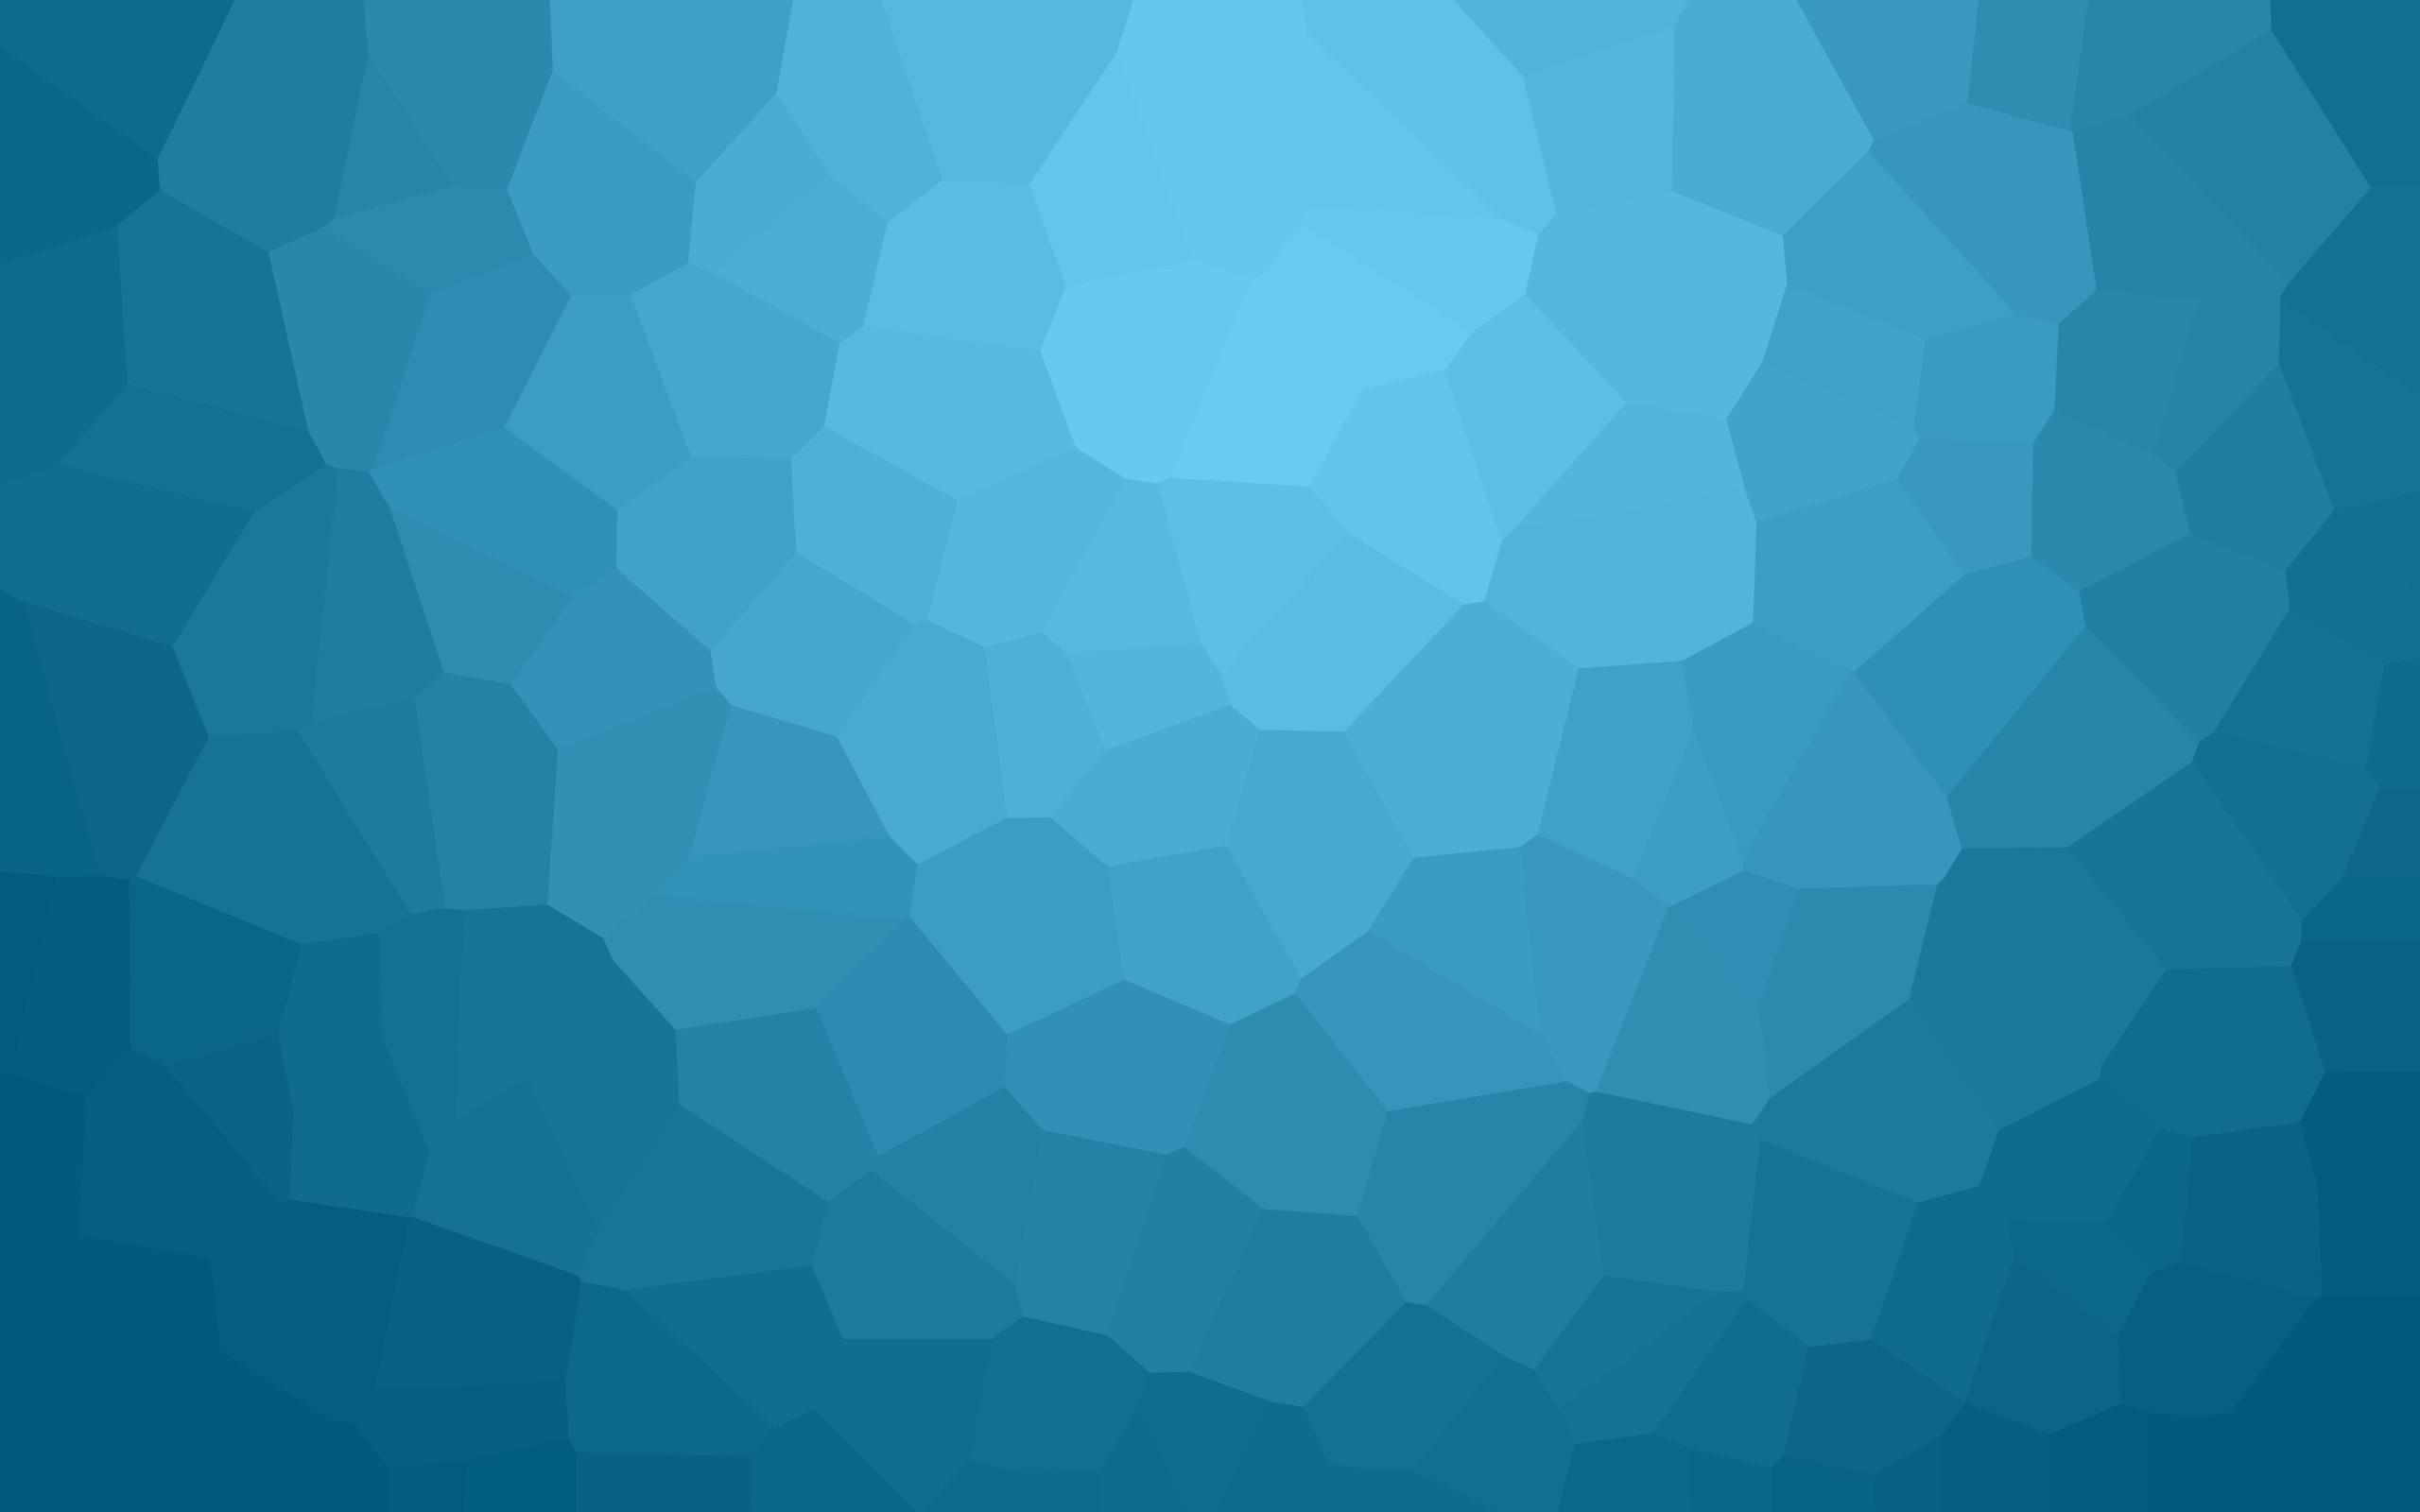 Res: 2560x1600, Choose wallpaper resolution